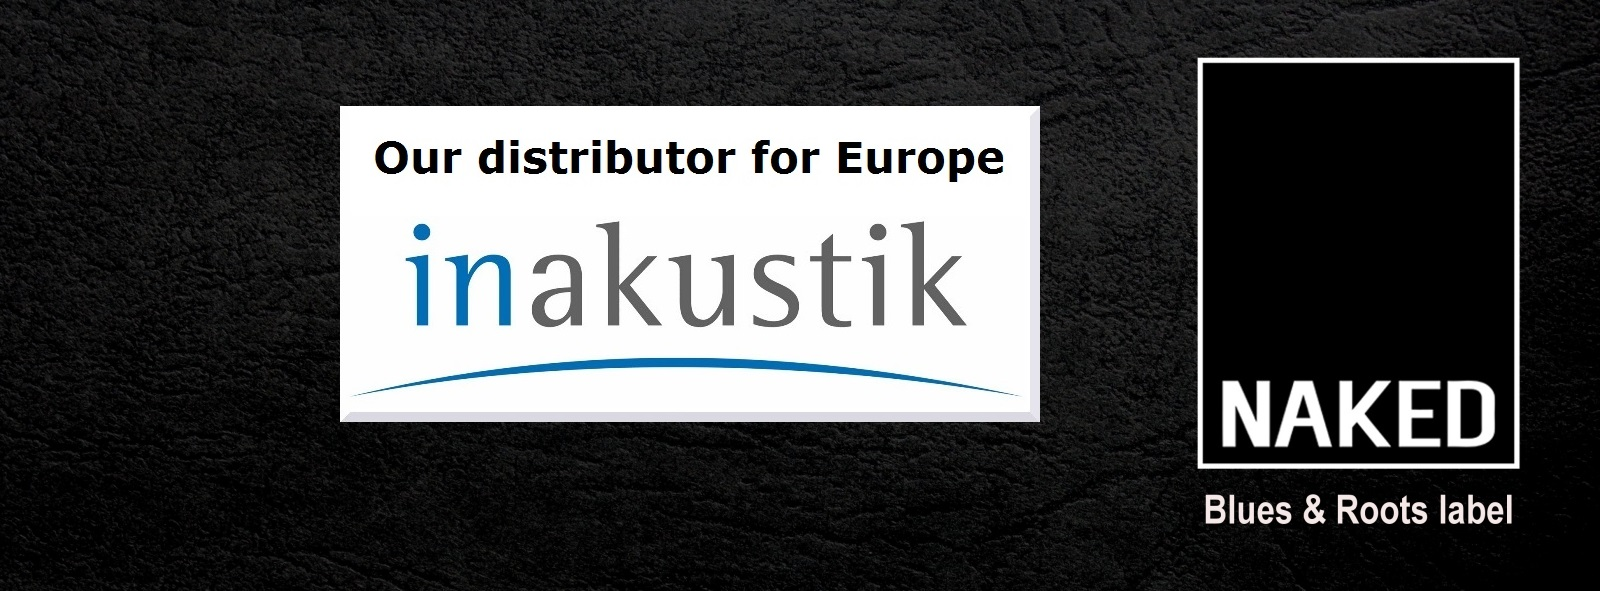 distributor for Europe